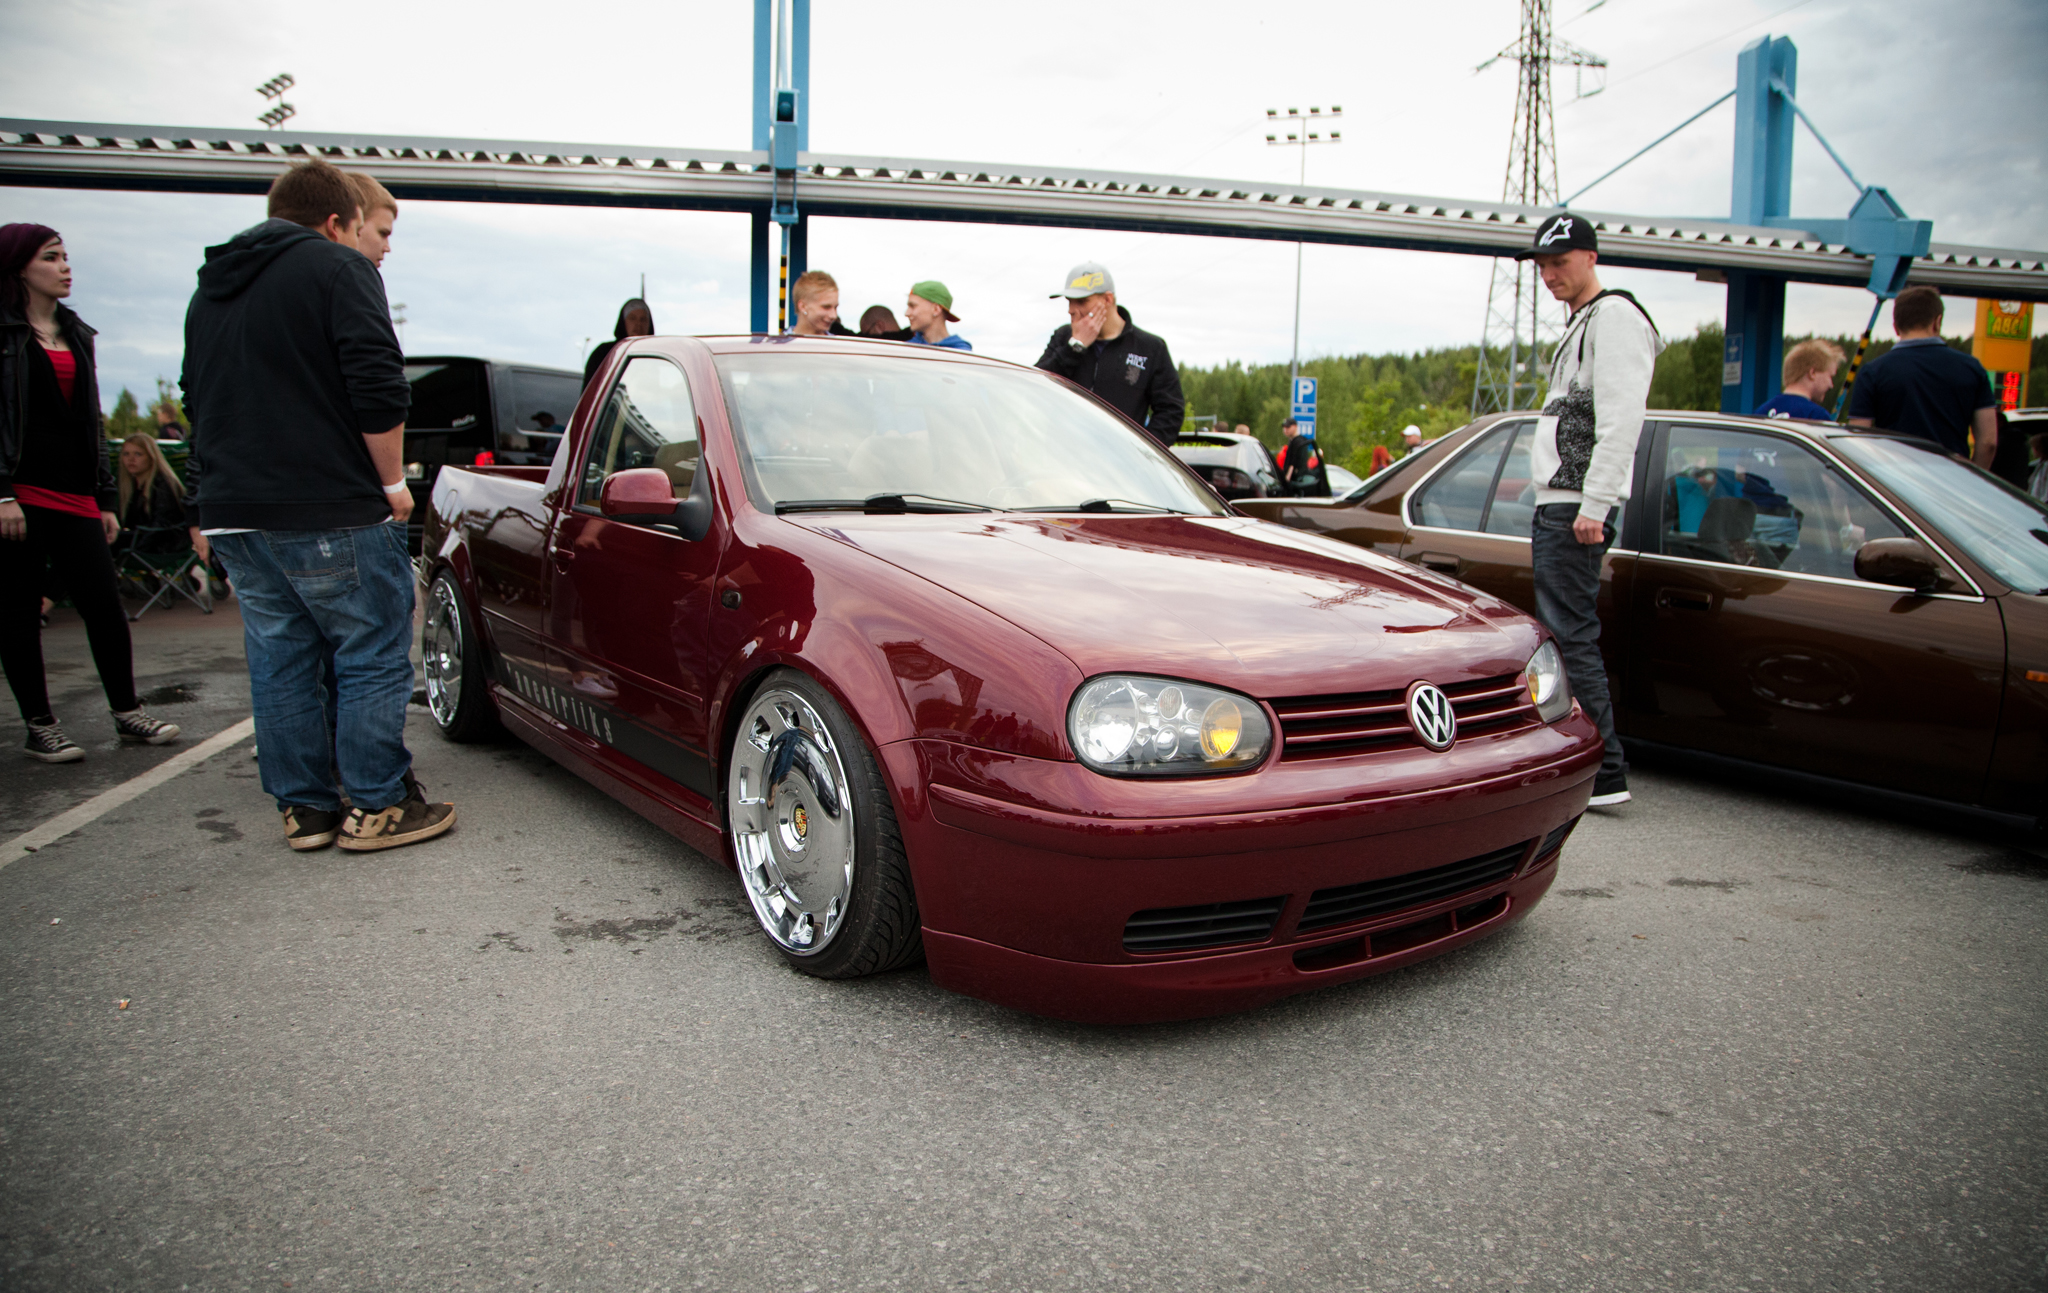 juh-o: Bagged familywagon VW Bora/golf IV UTE - Sivu 12 _full